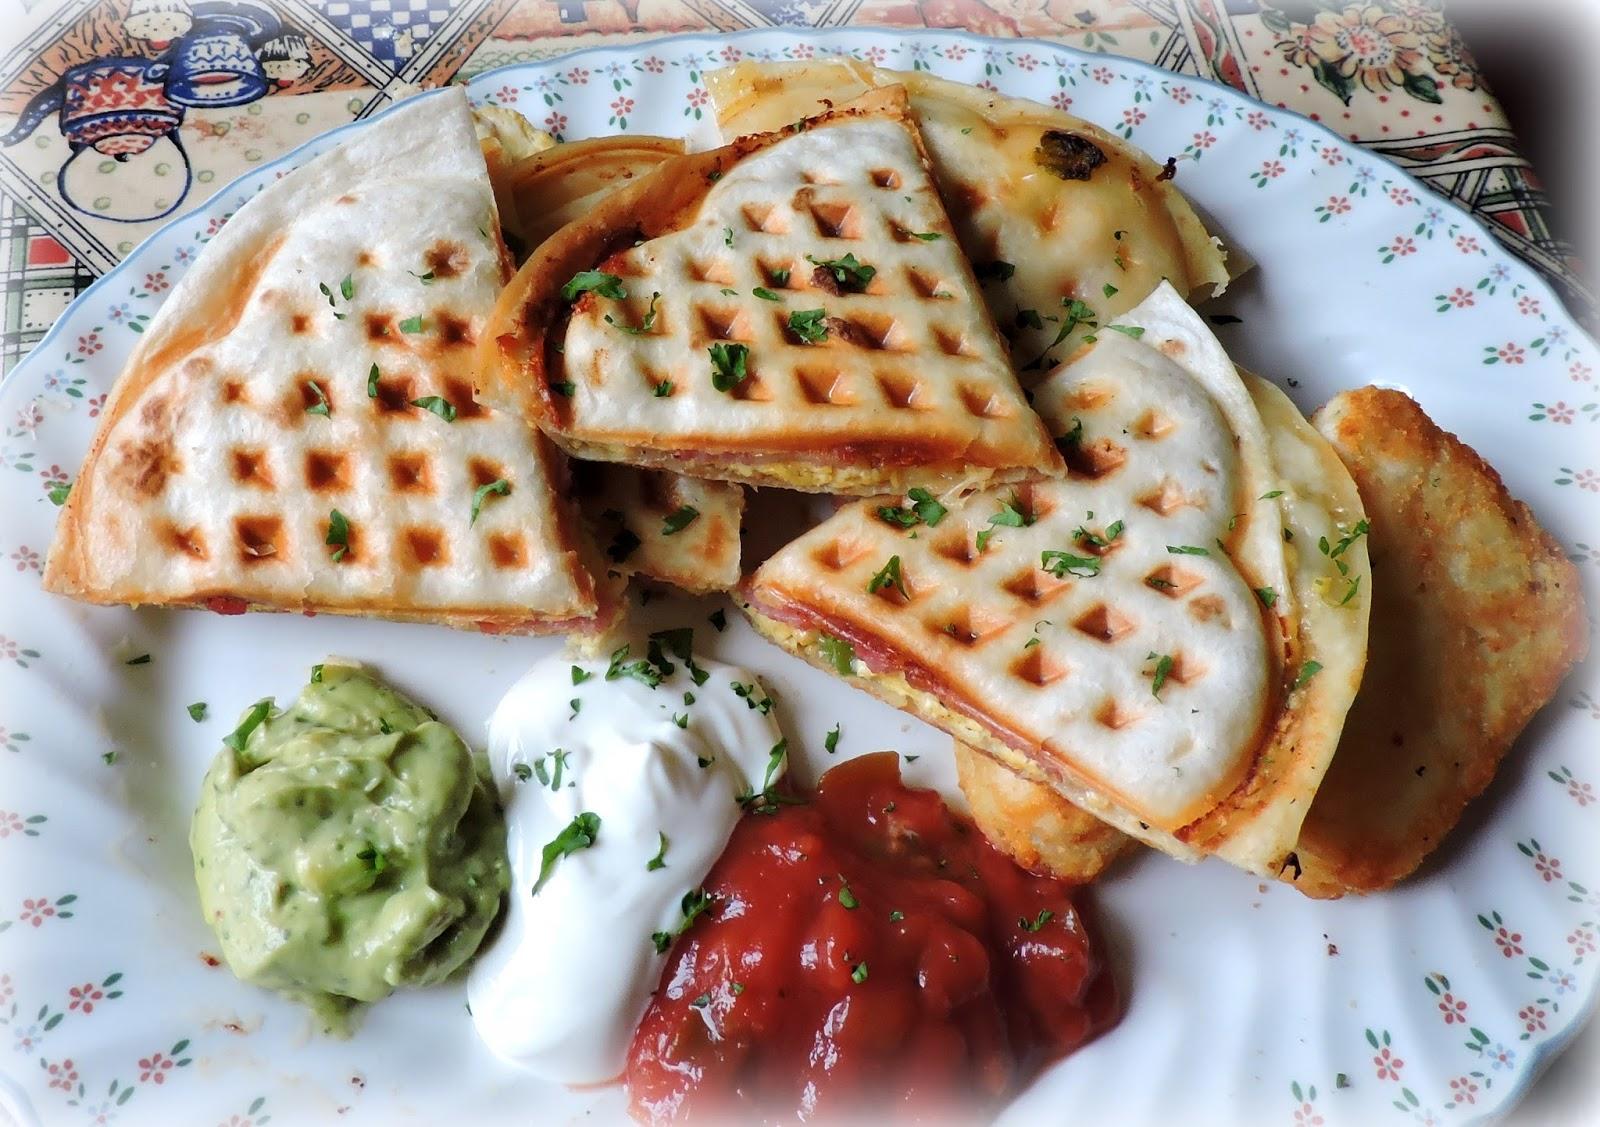 Image result for Waffle Maker Quesadilla